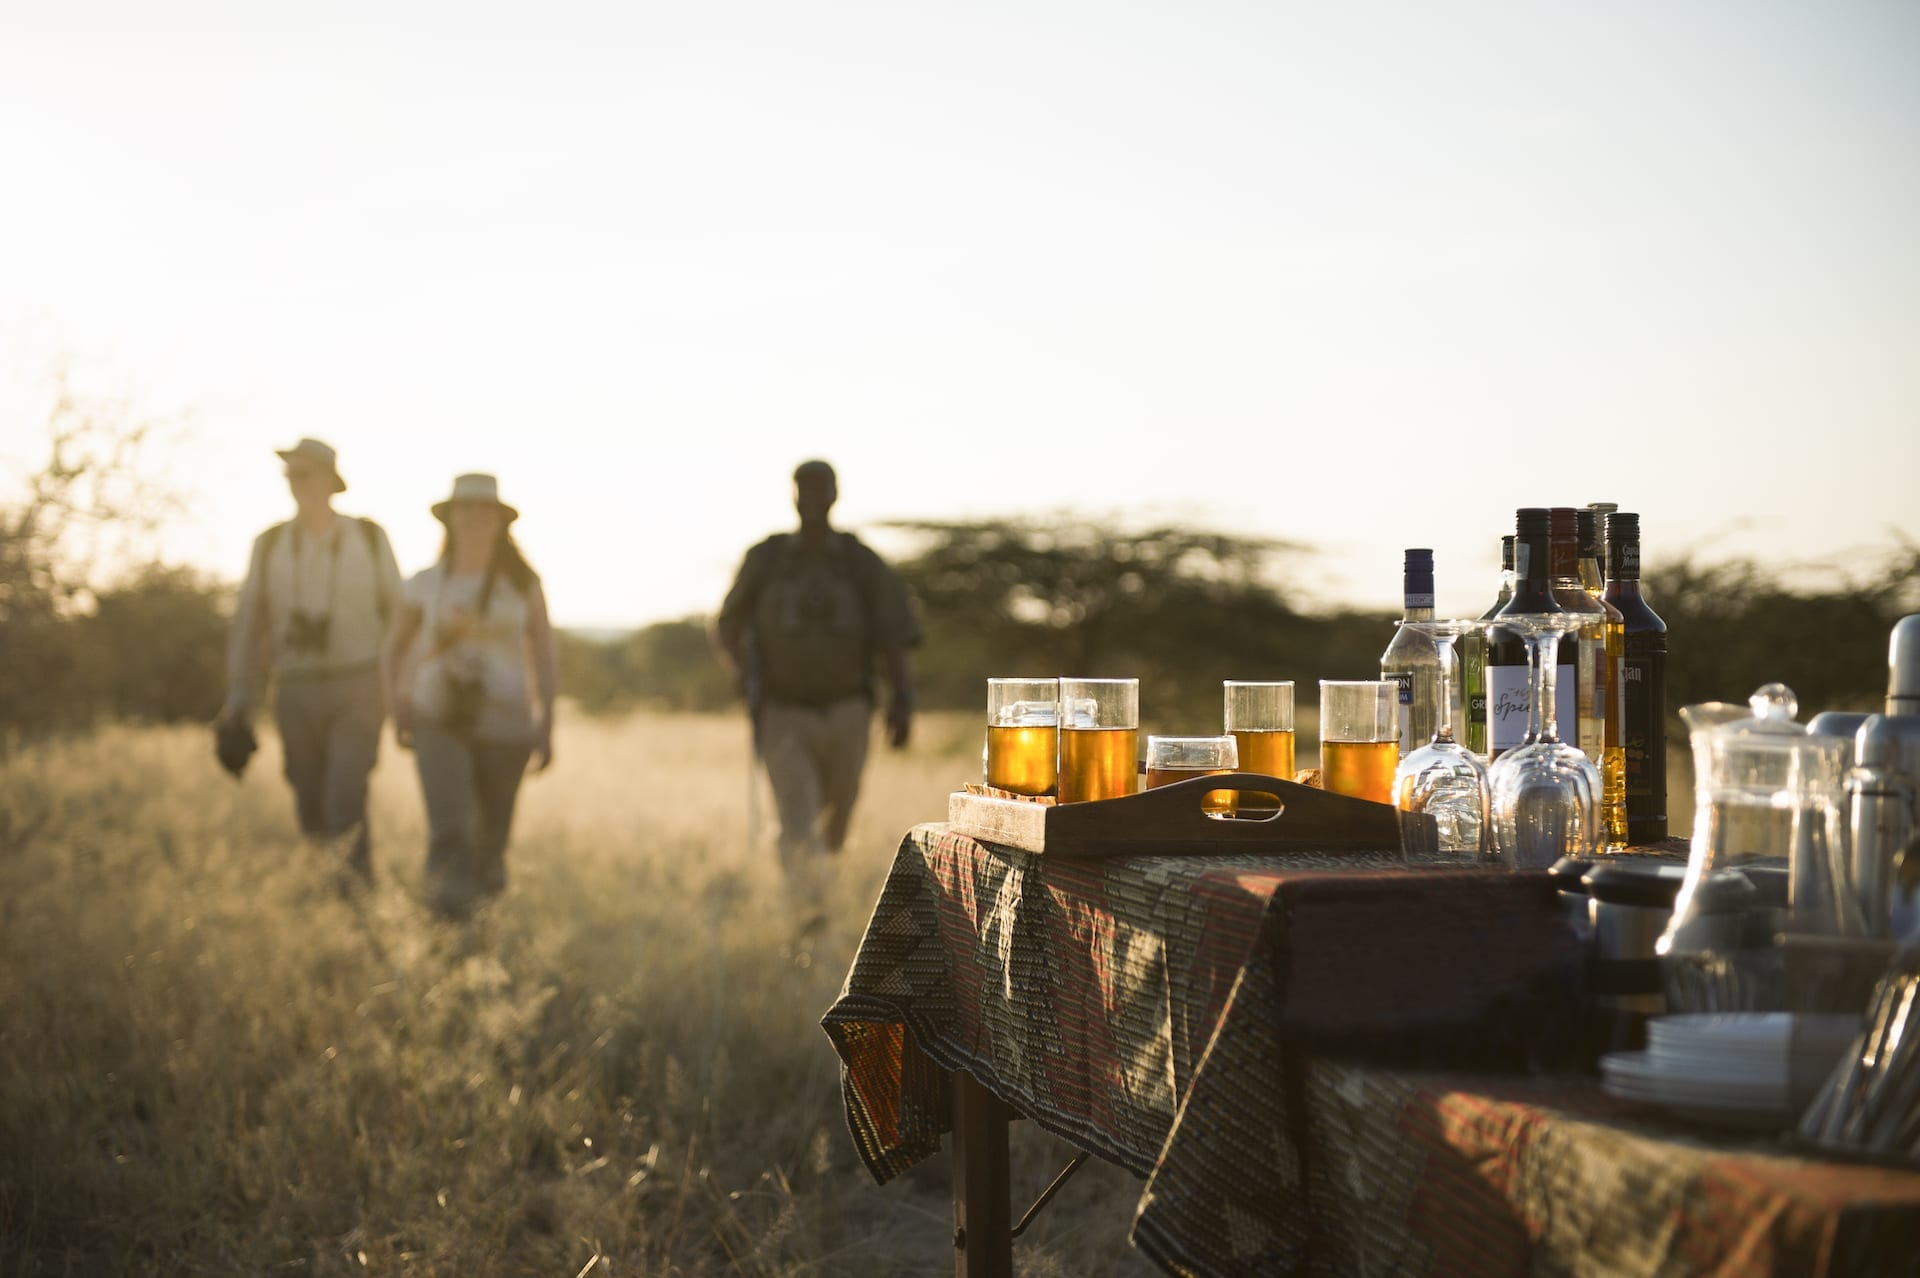 olivers-camp-walking-safari-sundowners-eliza-deacon-hr